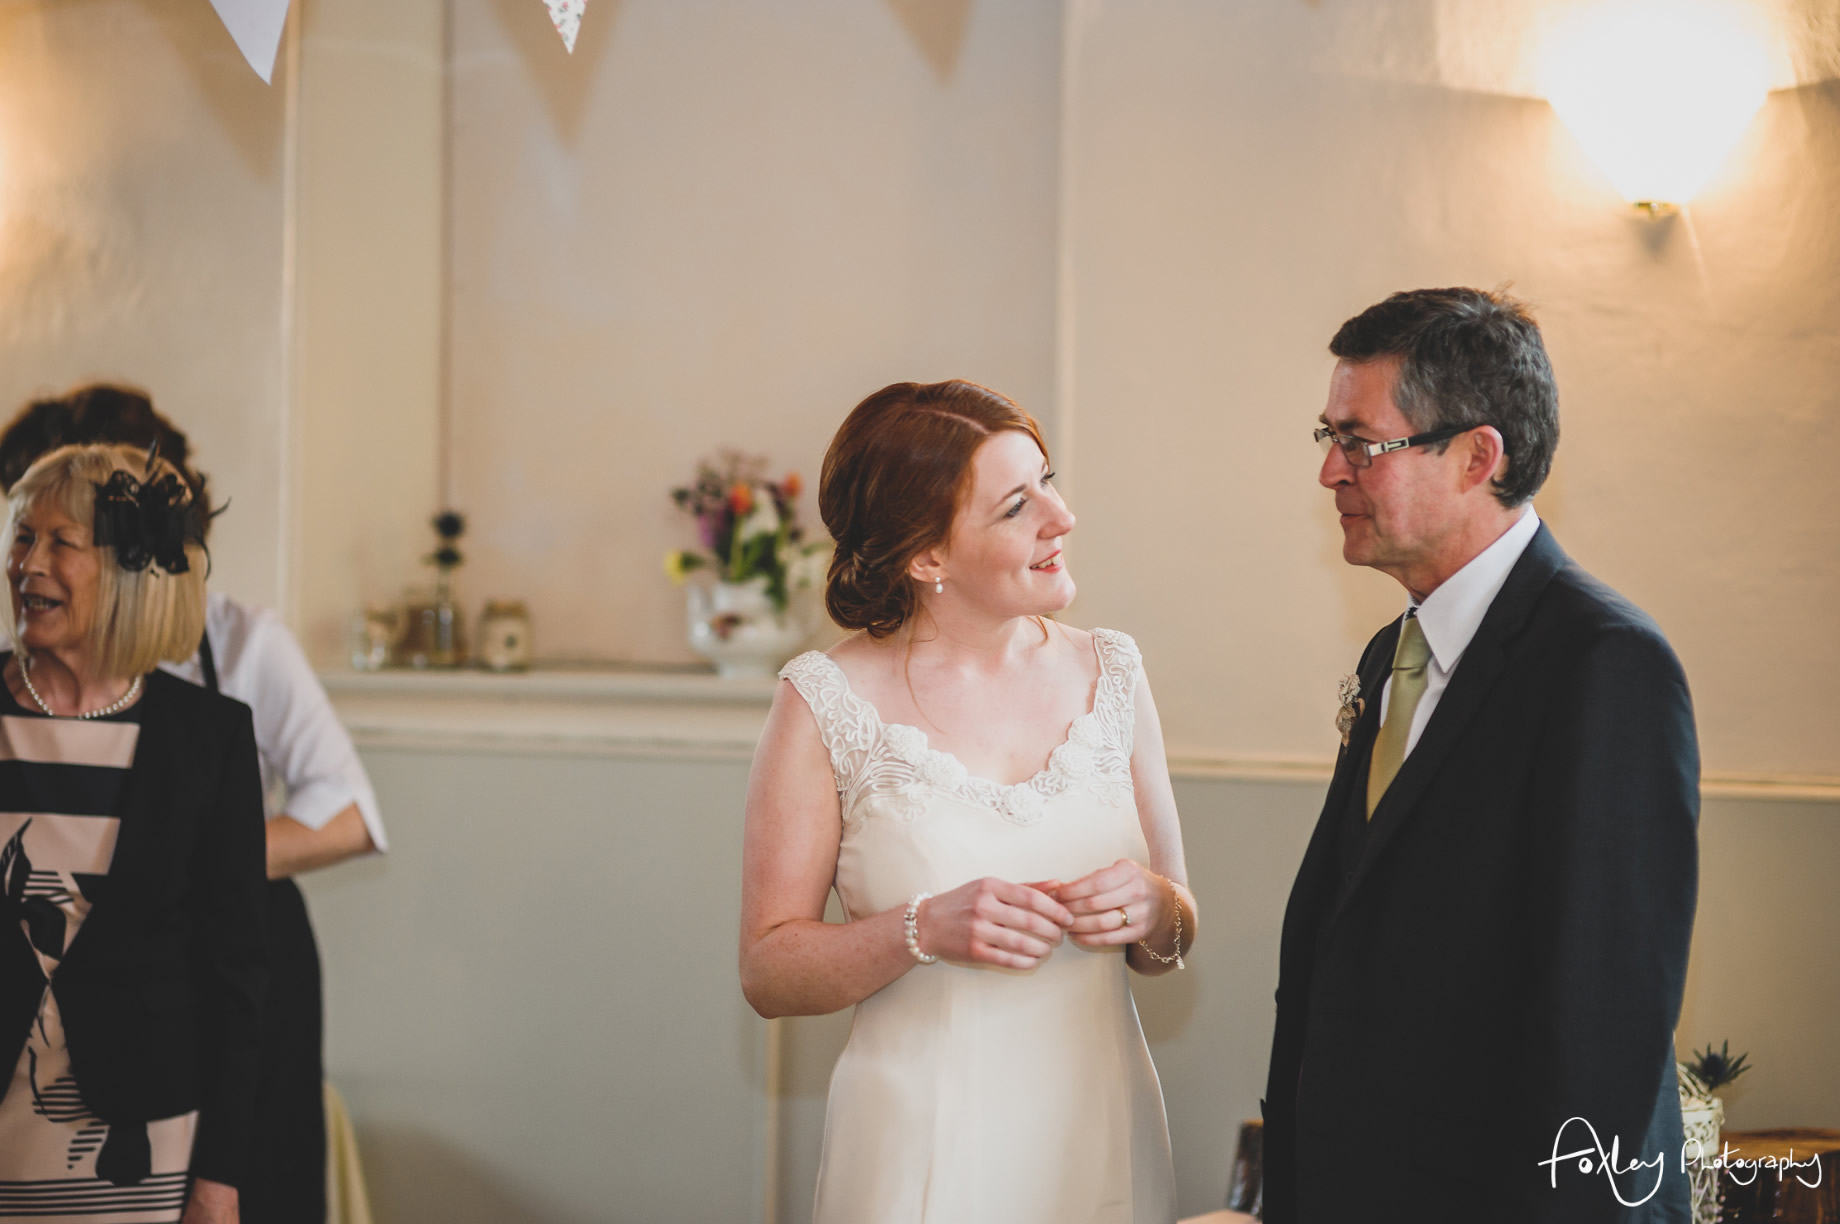 Mel-and-Lewis-Wedding-at-Barley-Village-Hall-138